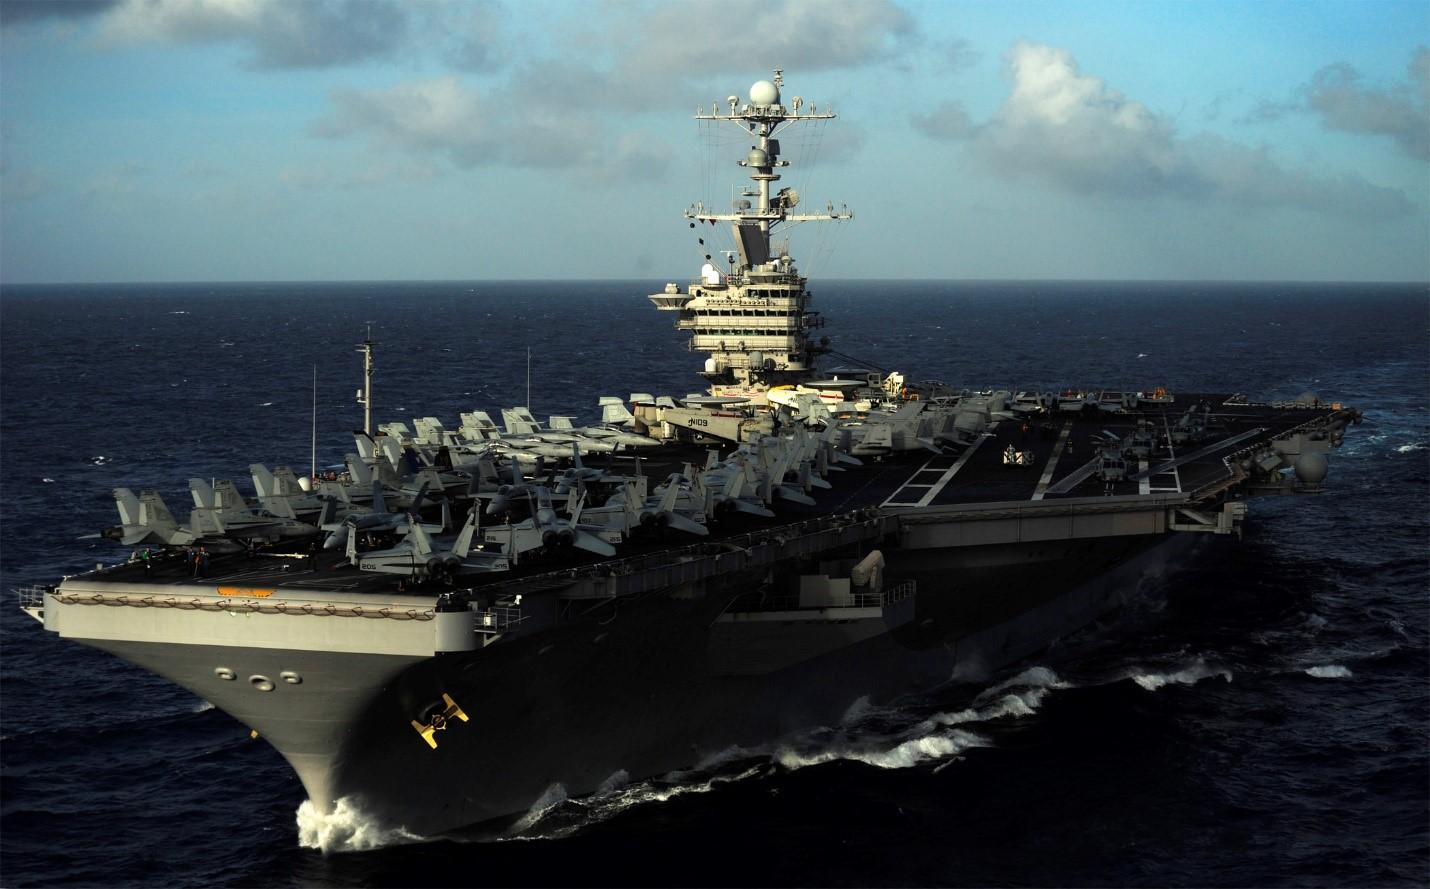 Авианосец USS John C. Stennis